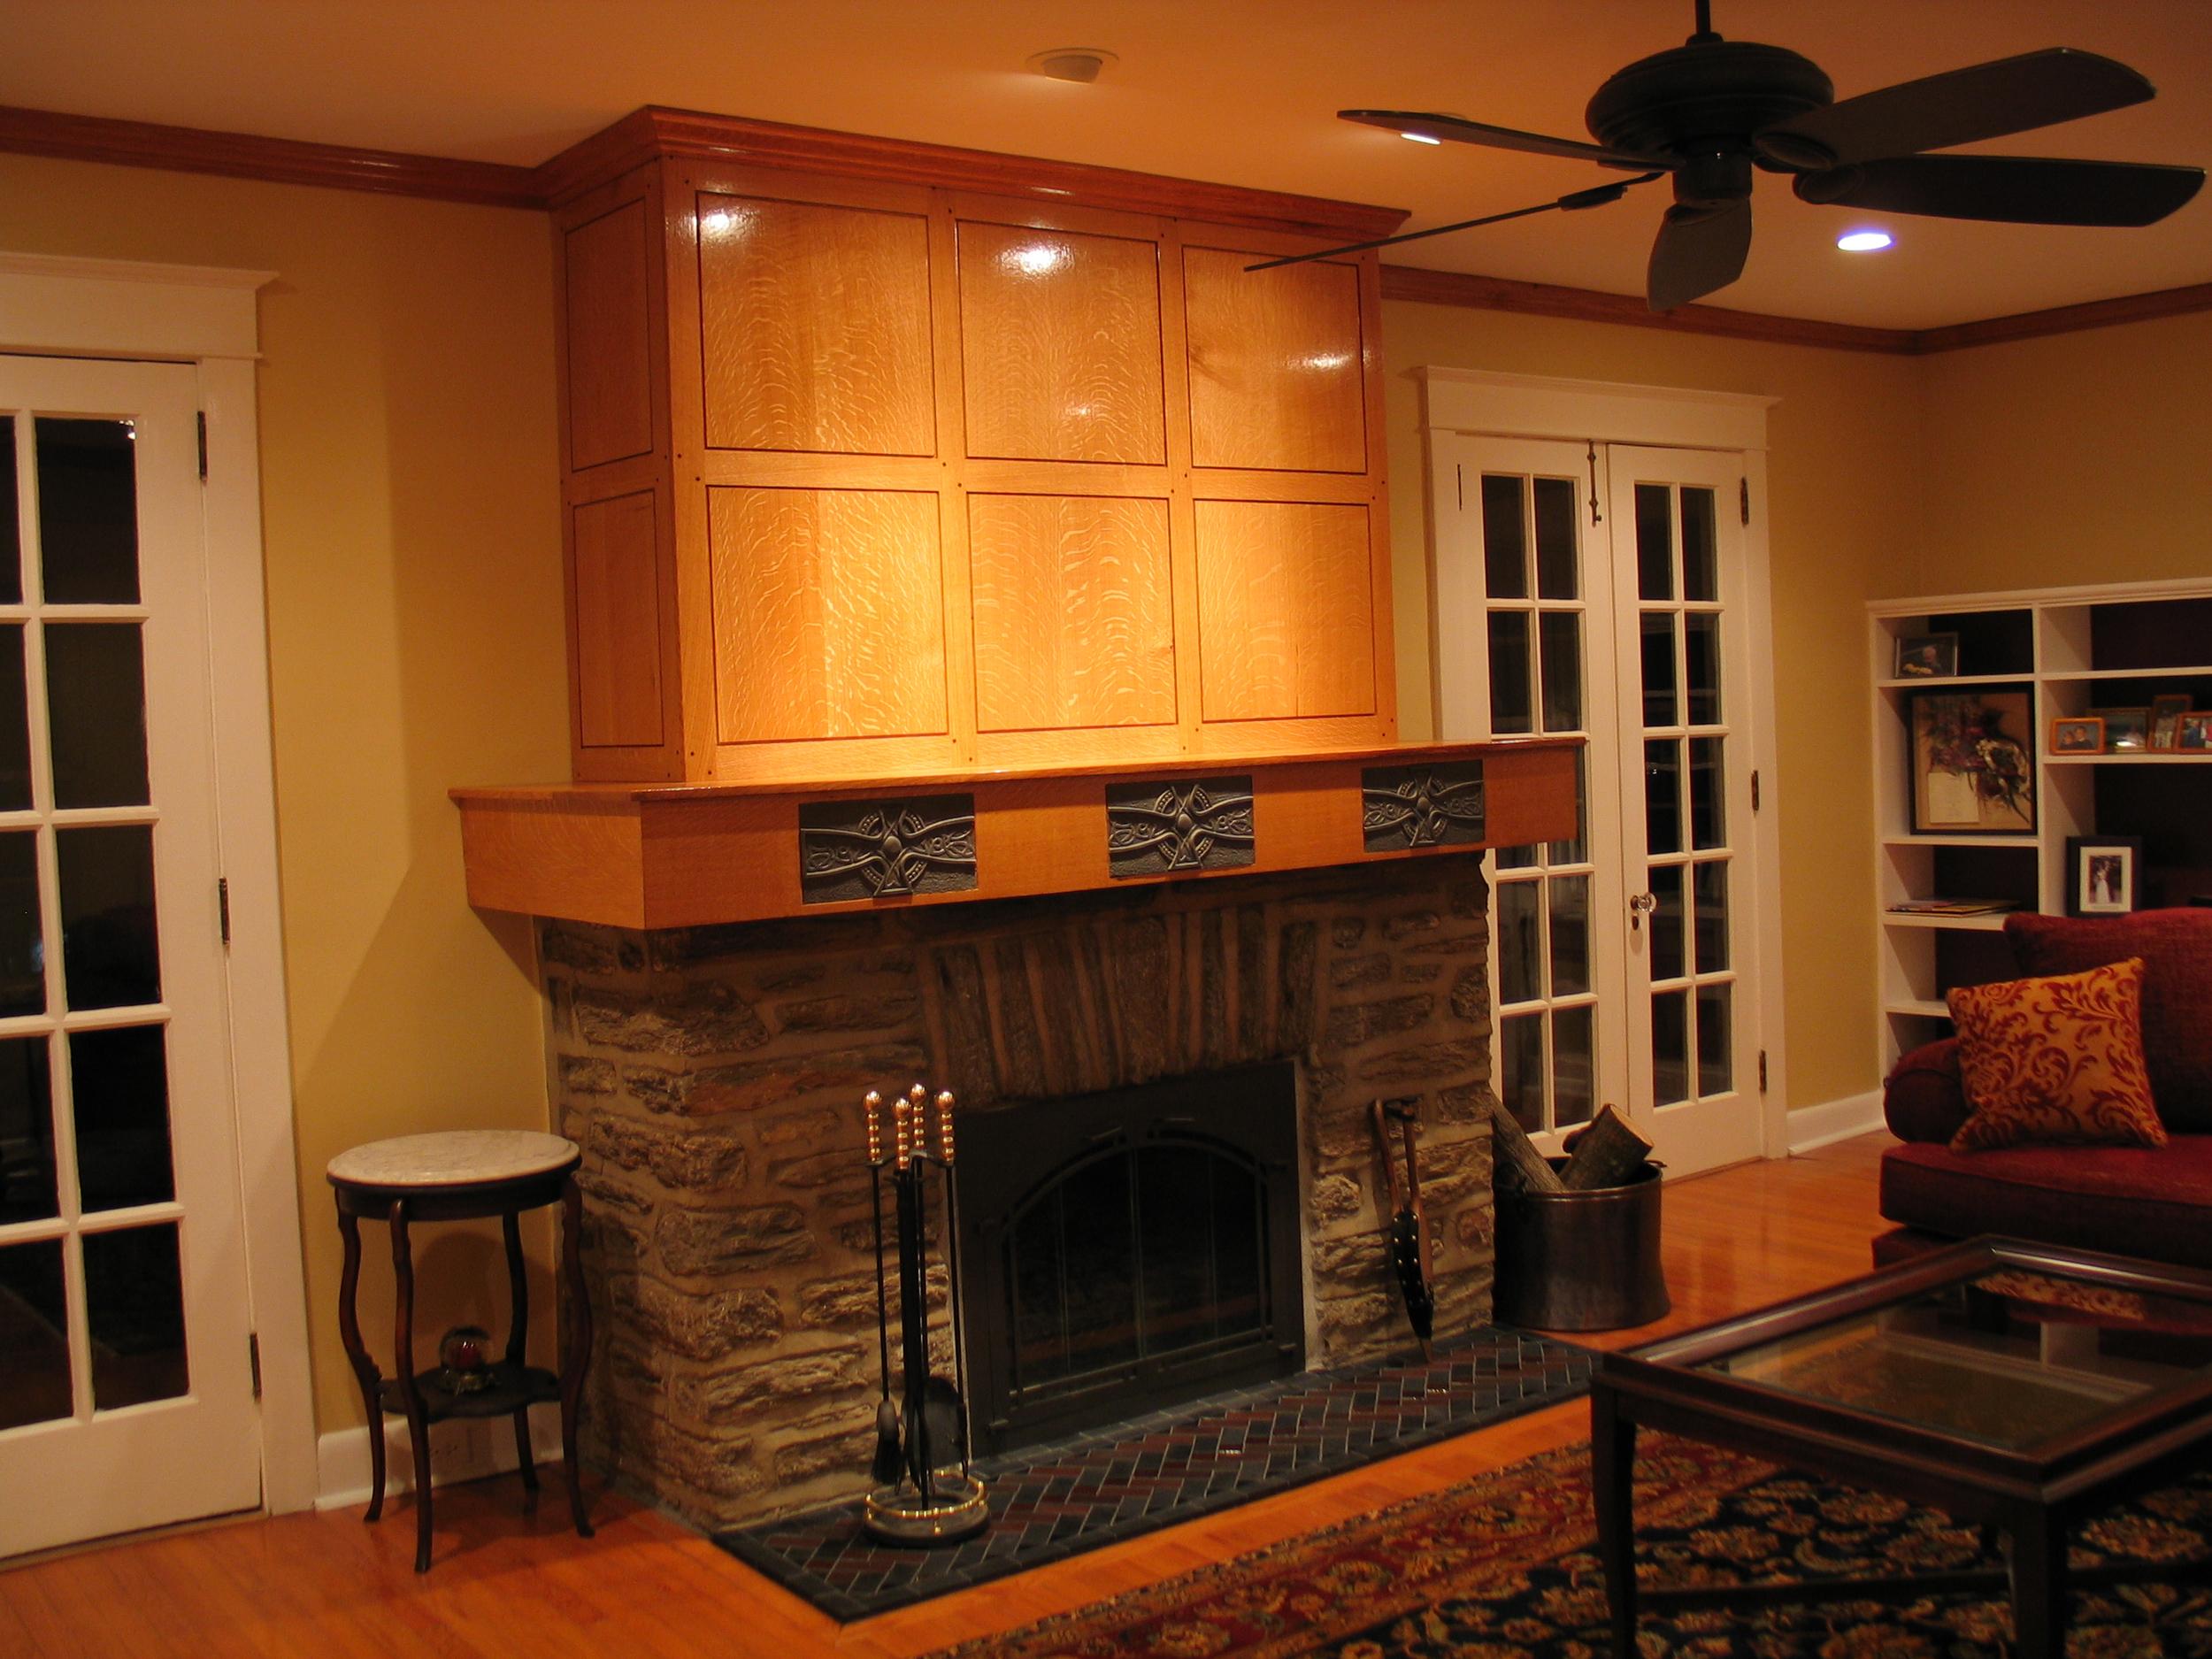 Quarter-sawn White Oak Fireplace and Mantel